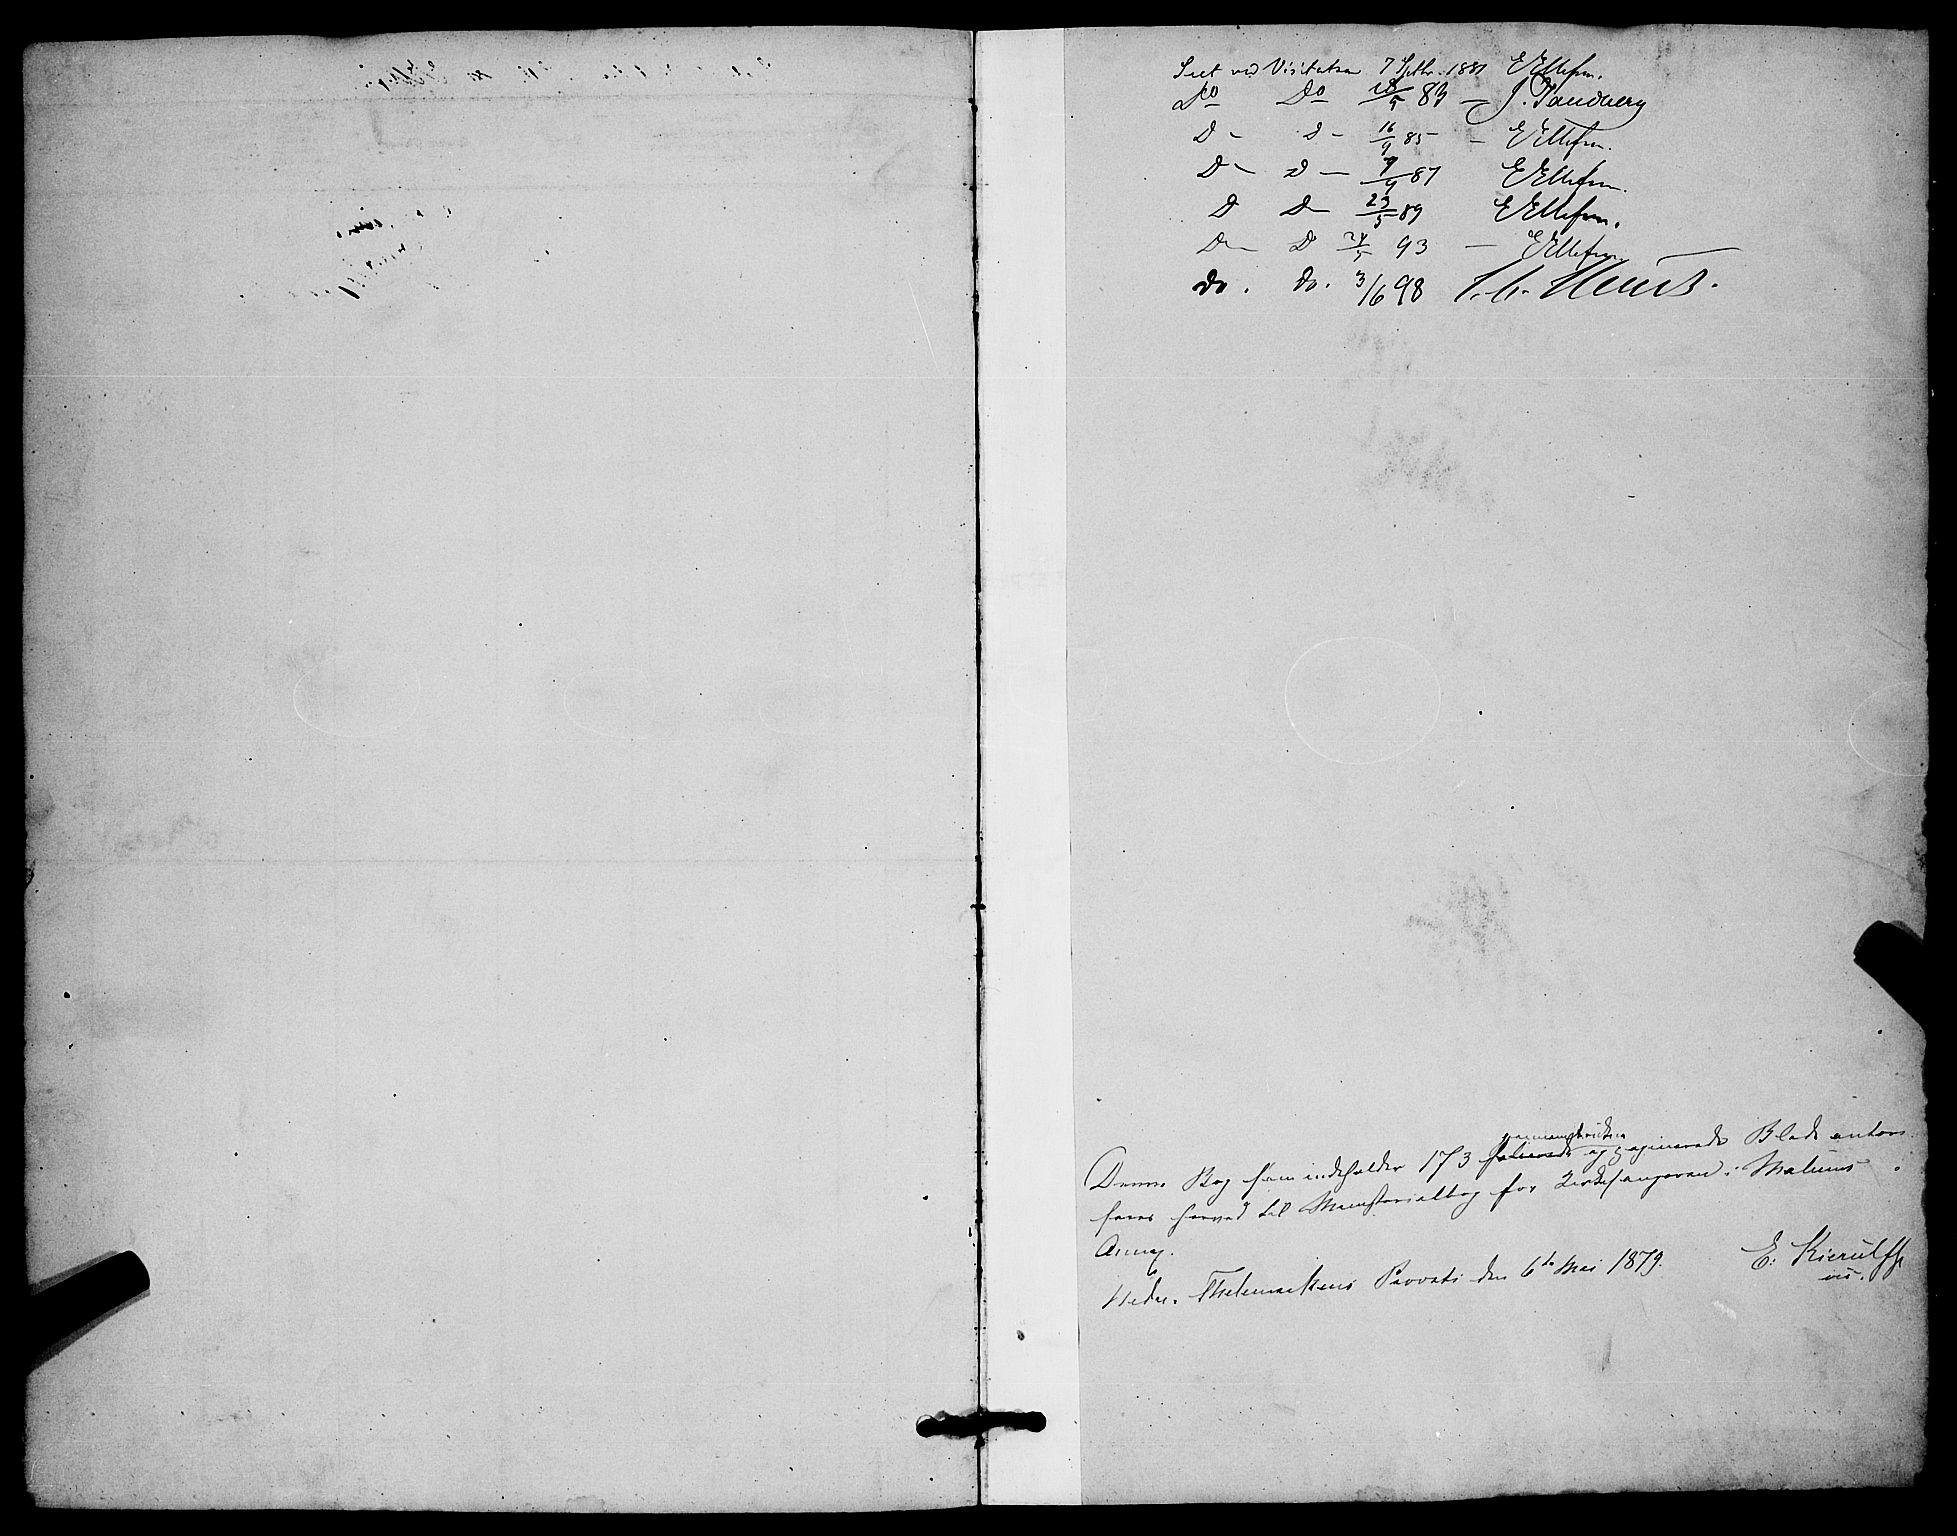 SAKO, Solum kirkebøker, G/Gb/L0003: Klokkerbok nr. II 3, 1880-1898